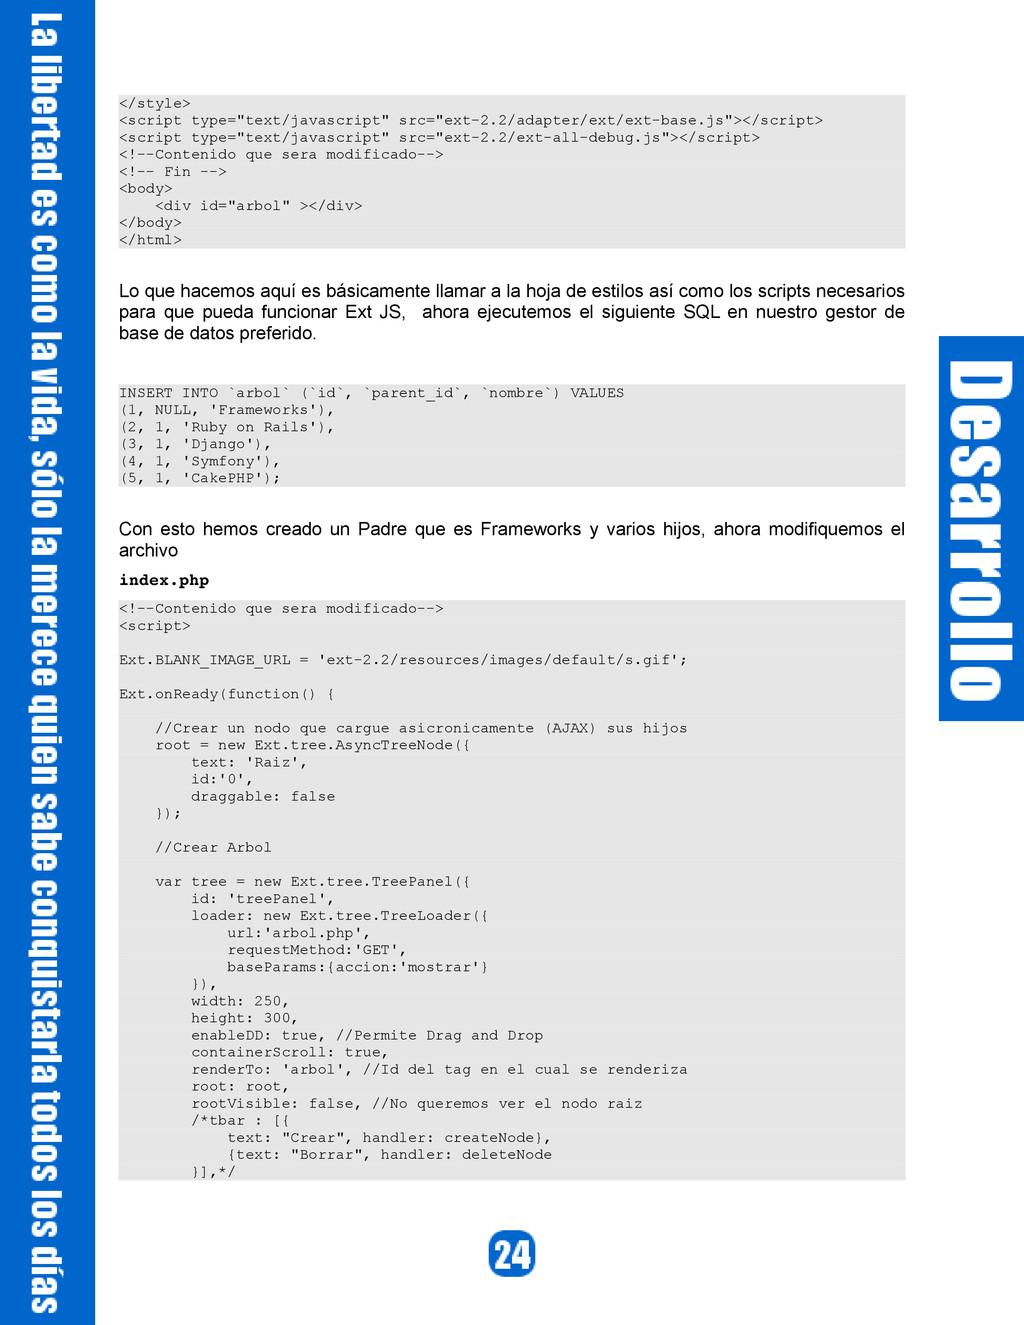 "</style> <script type=""text/javascript"" src=""ex..."